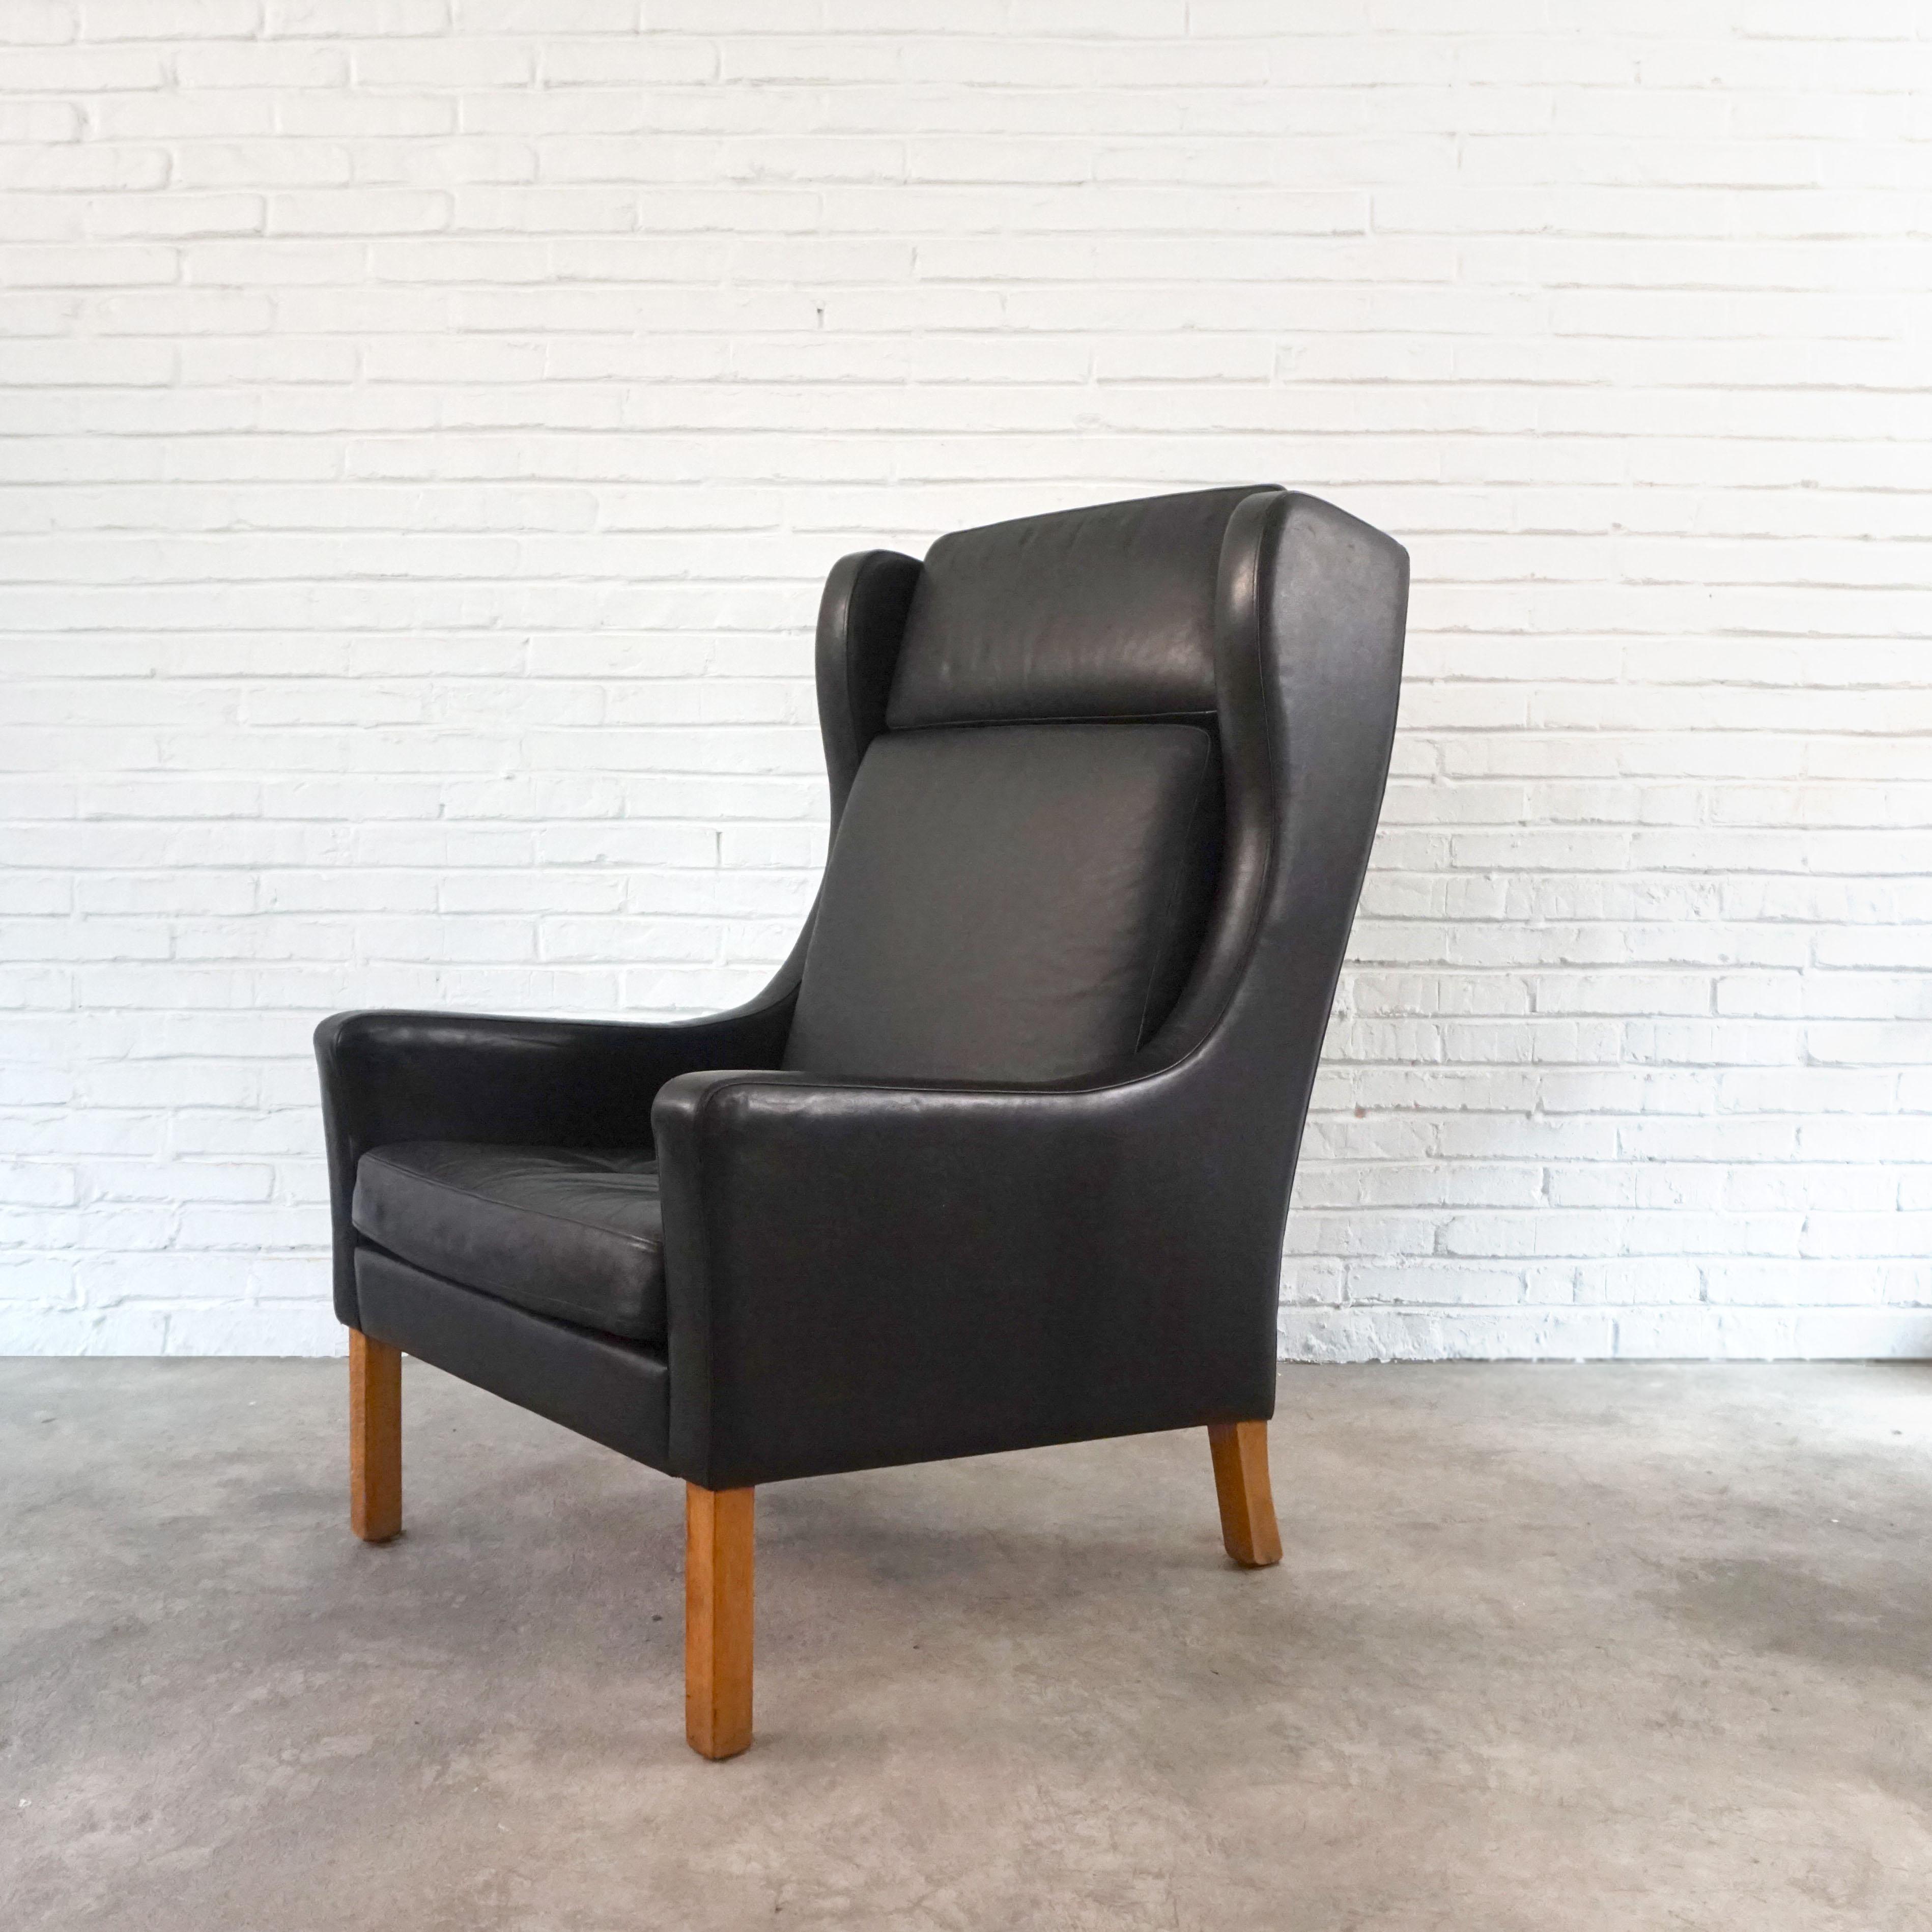 中式 Borge Mogensen休闲椅2331 Easy chair 单人沙发Ottoman莫根森